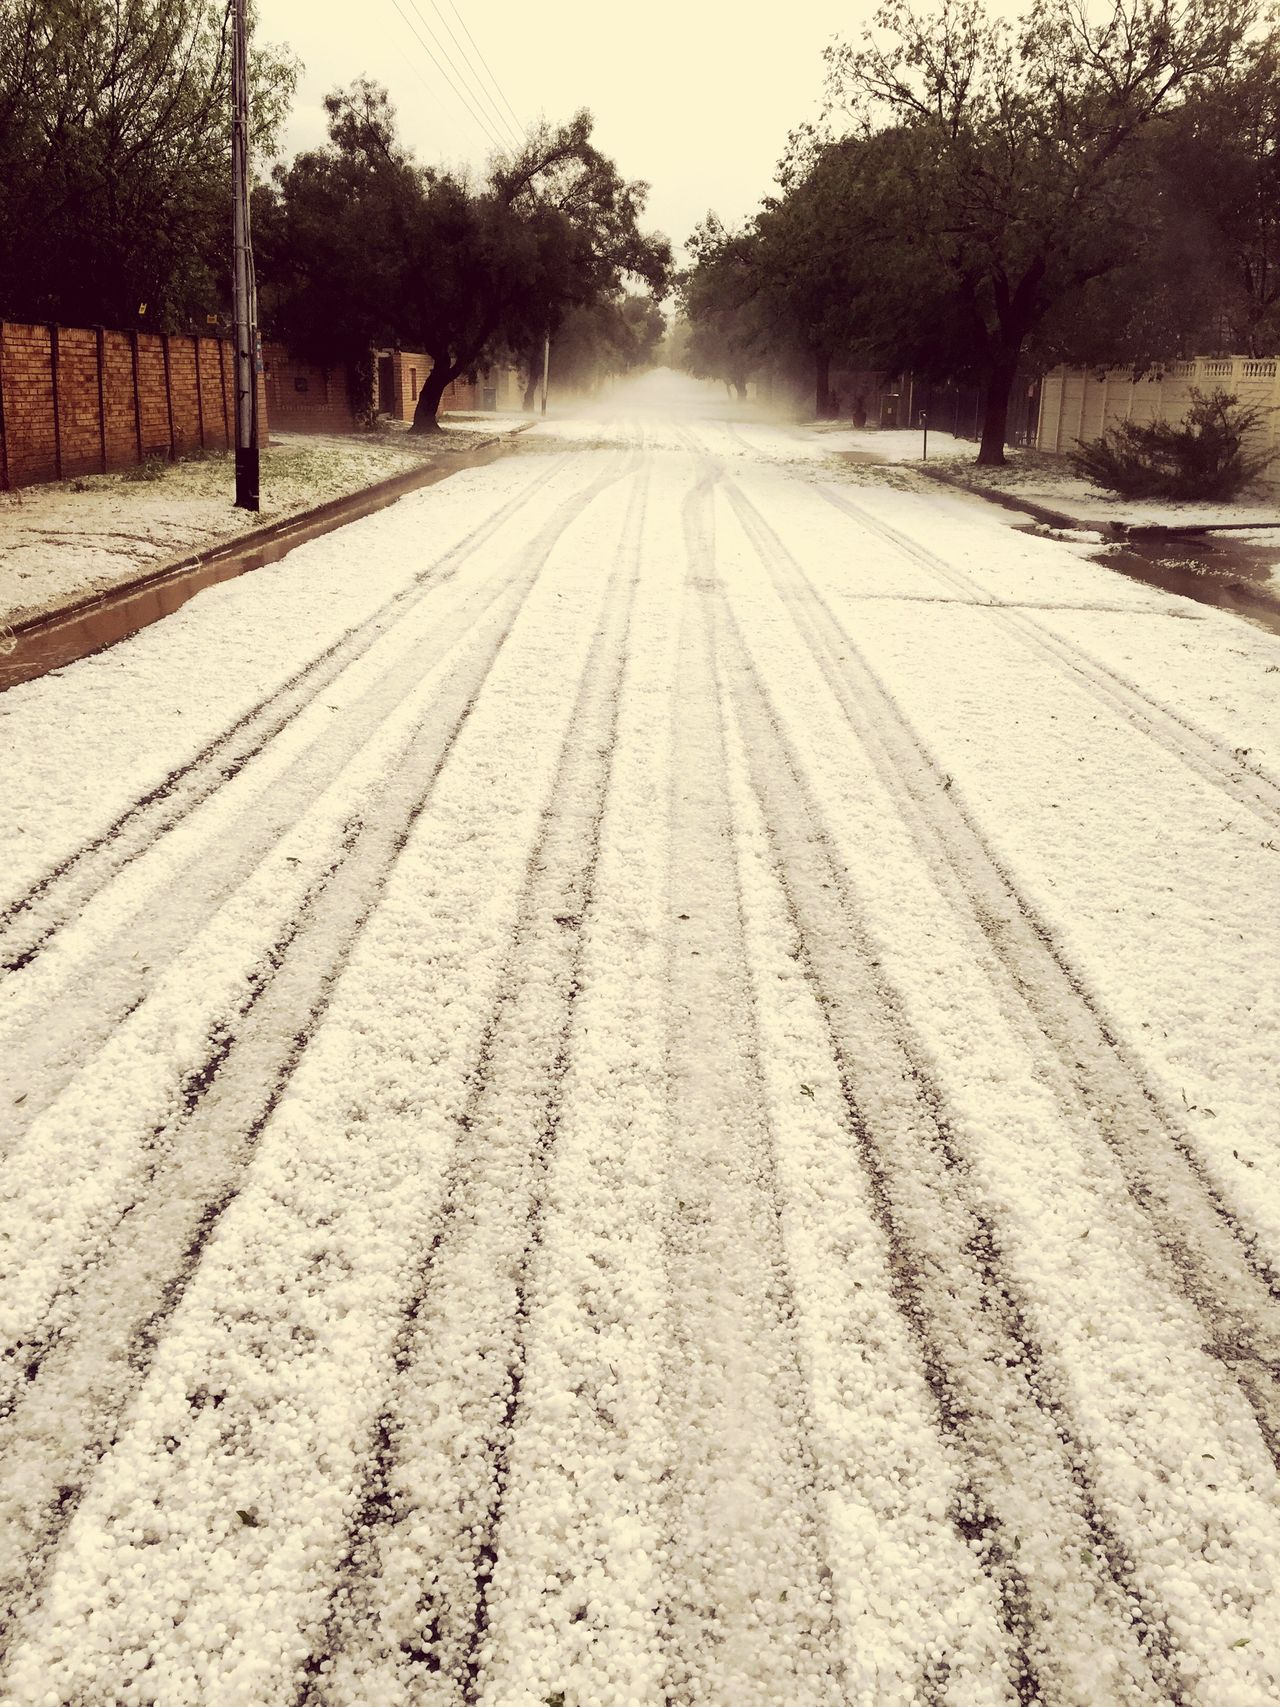 Hale storm in Bloemfontein Rain Rainstorm Halestorm Road